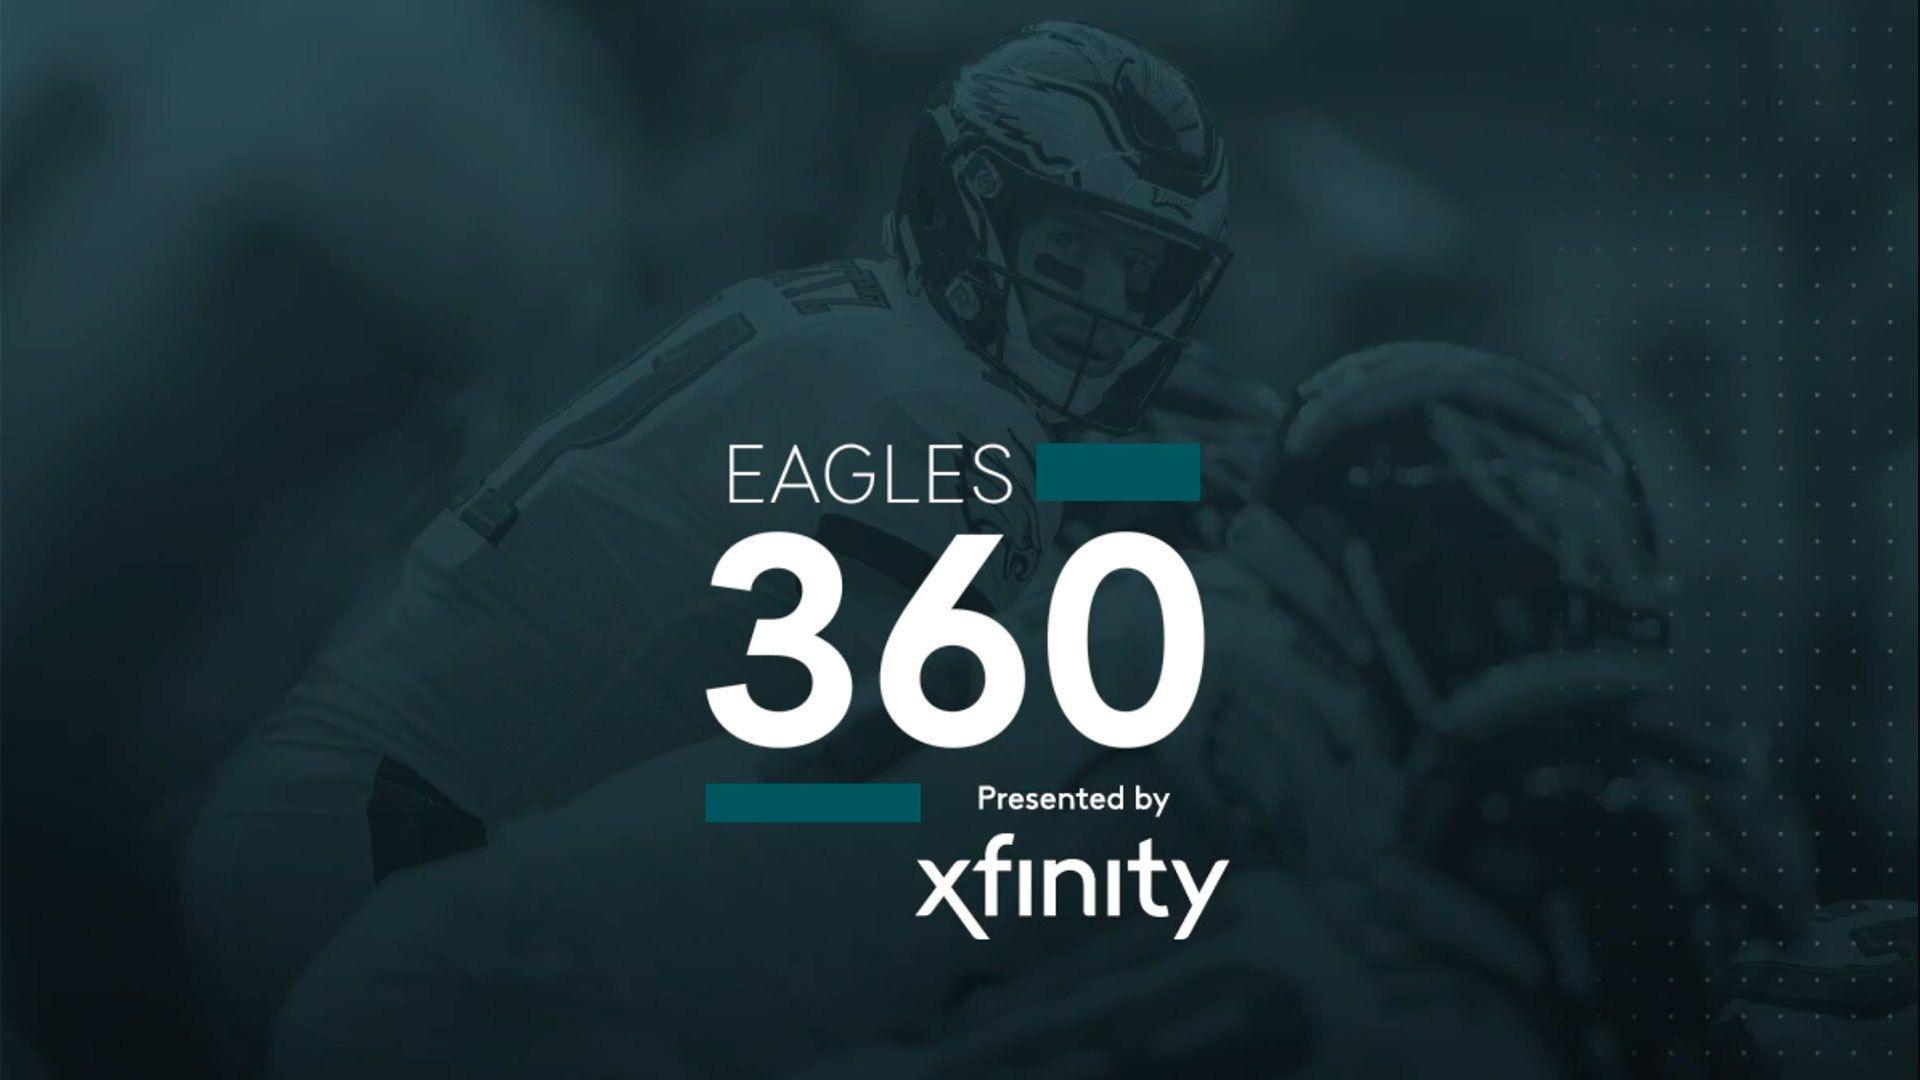 Eagles 360